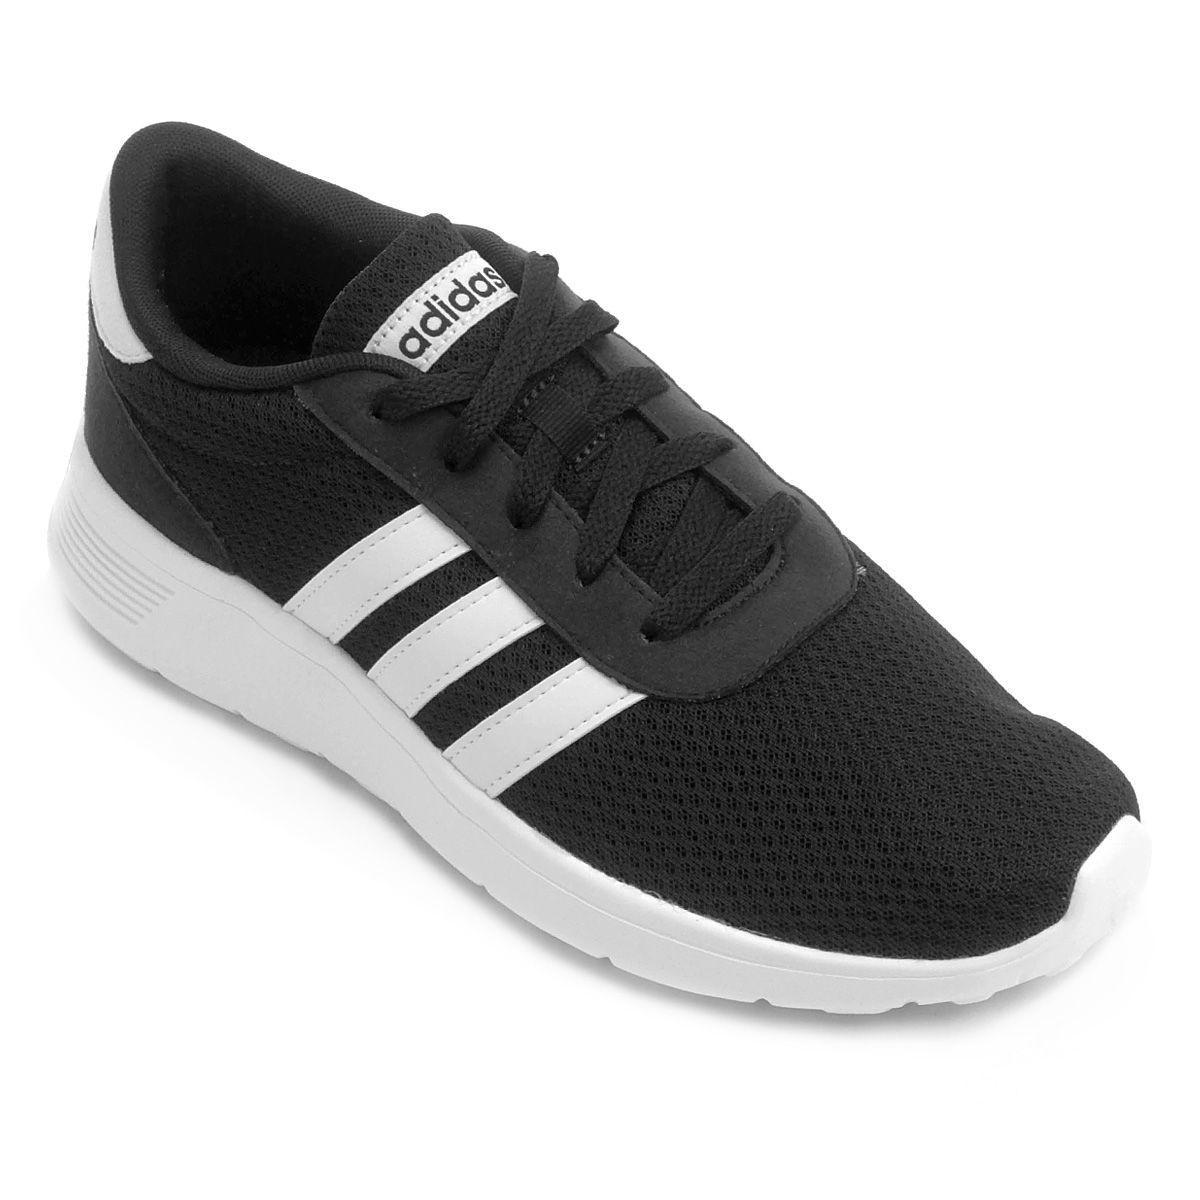 Tênis Adidas Lite Racer Masculino Preto/Branco